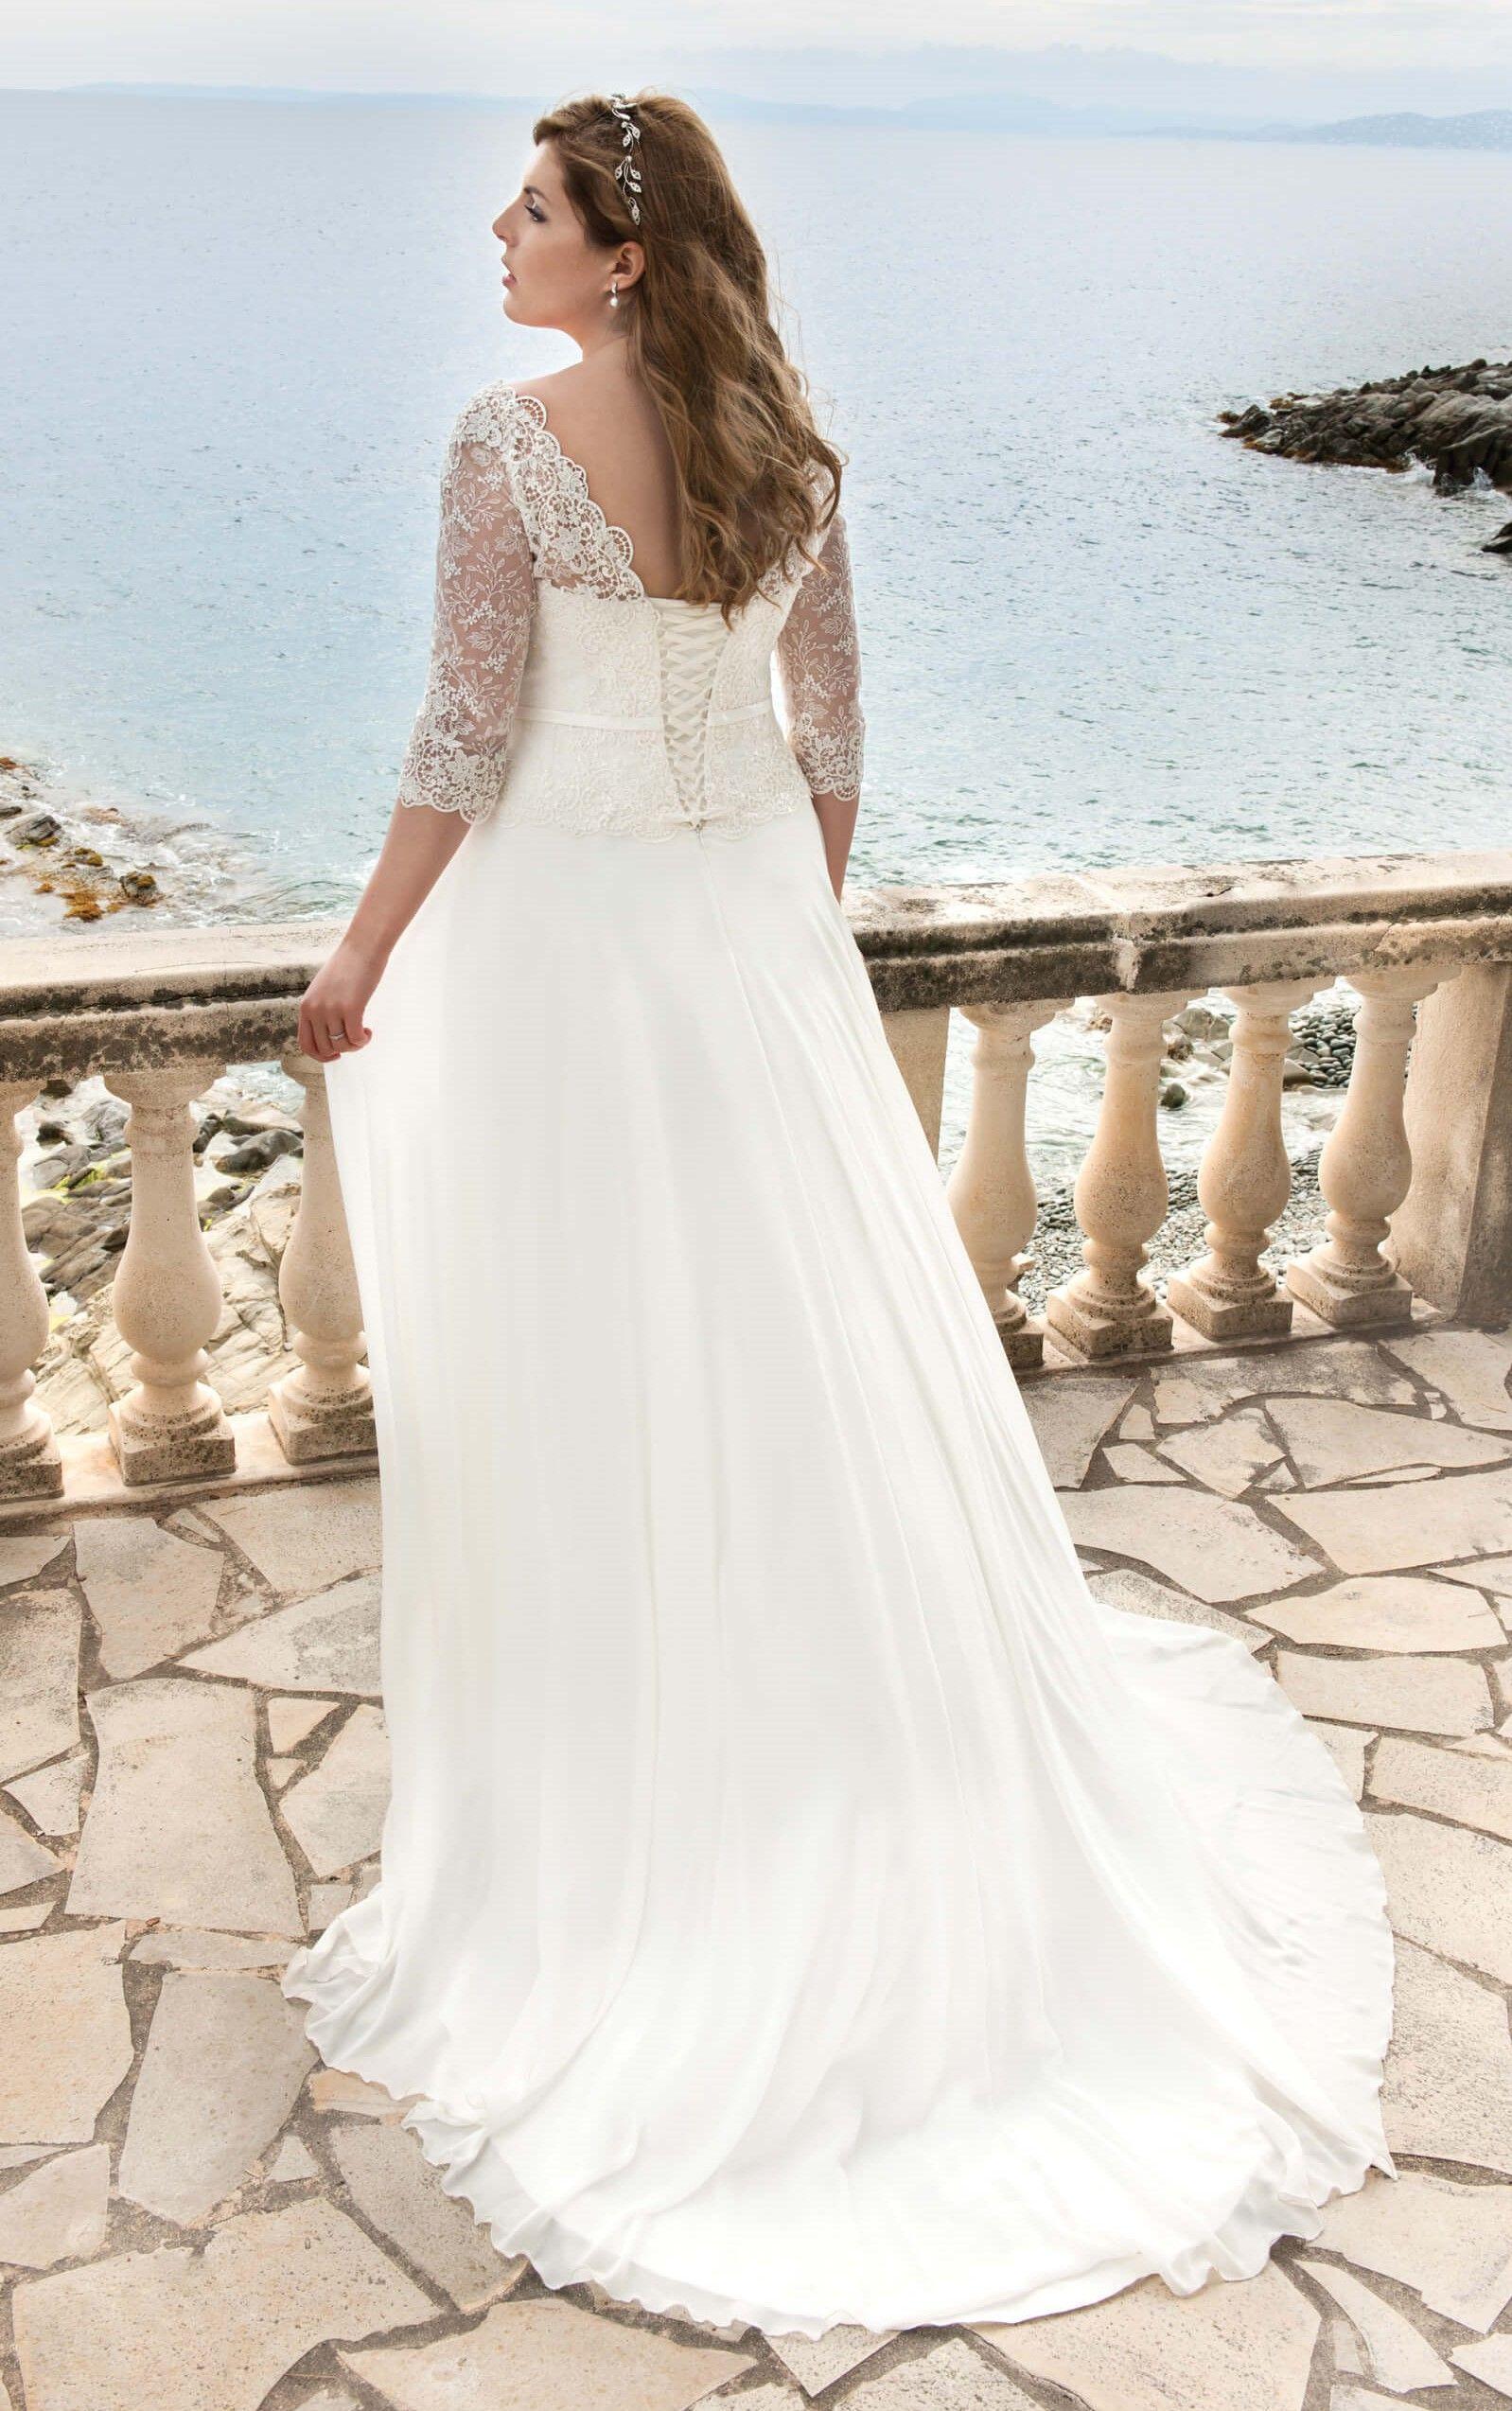 Wedding dress trouwjurk bruidsjurk plus size wedding curves bruiloft